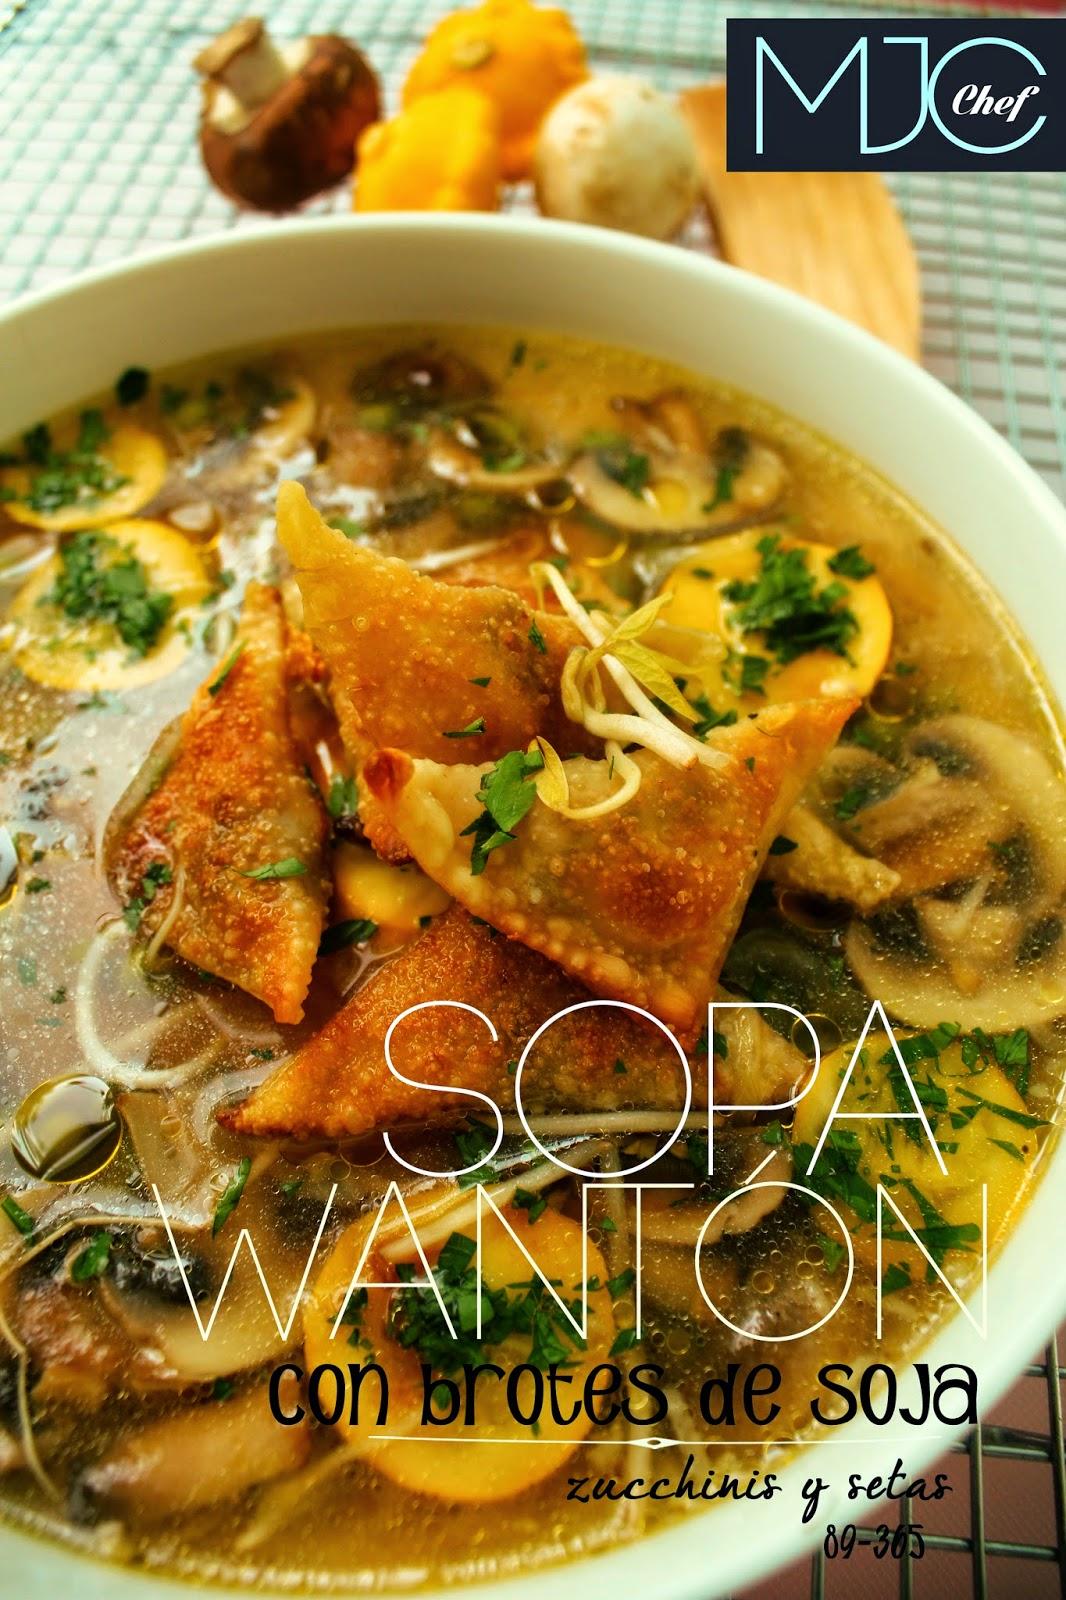 Sopa wantón